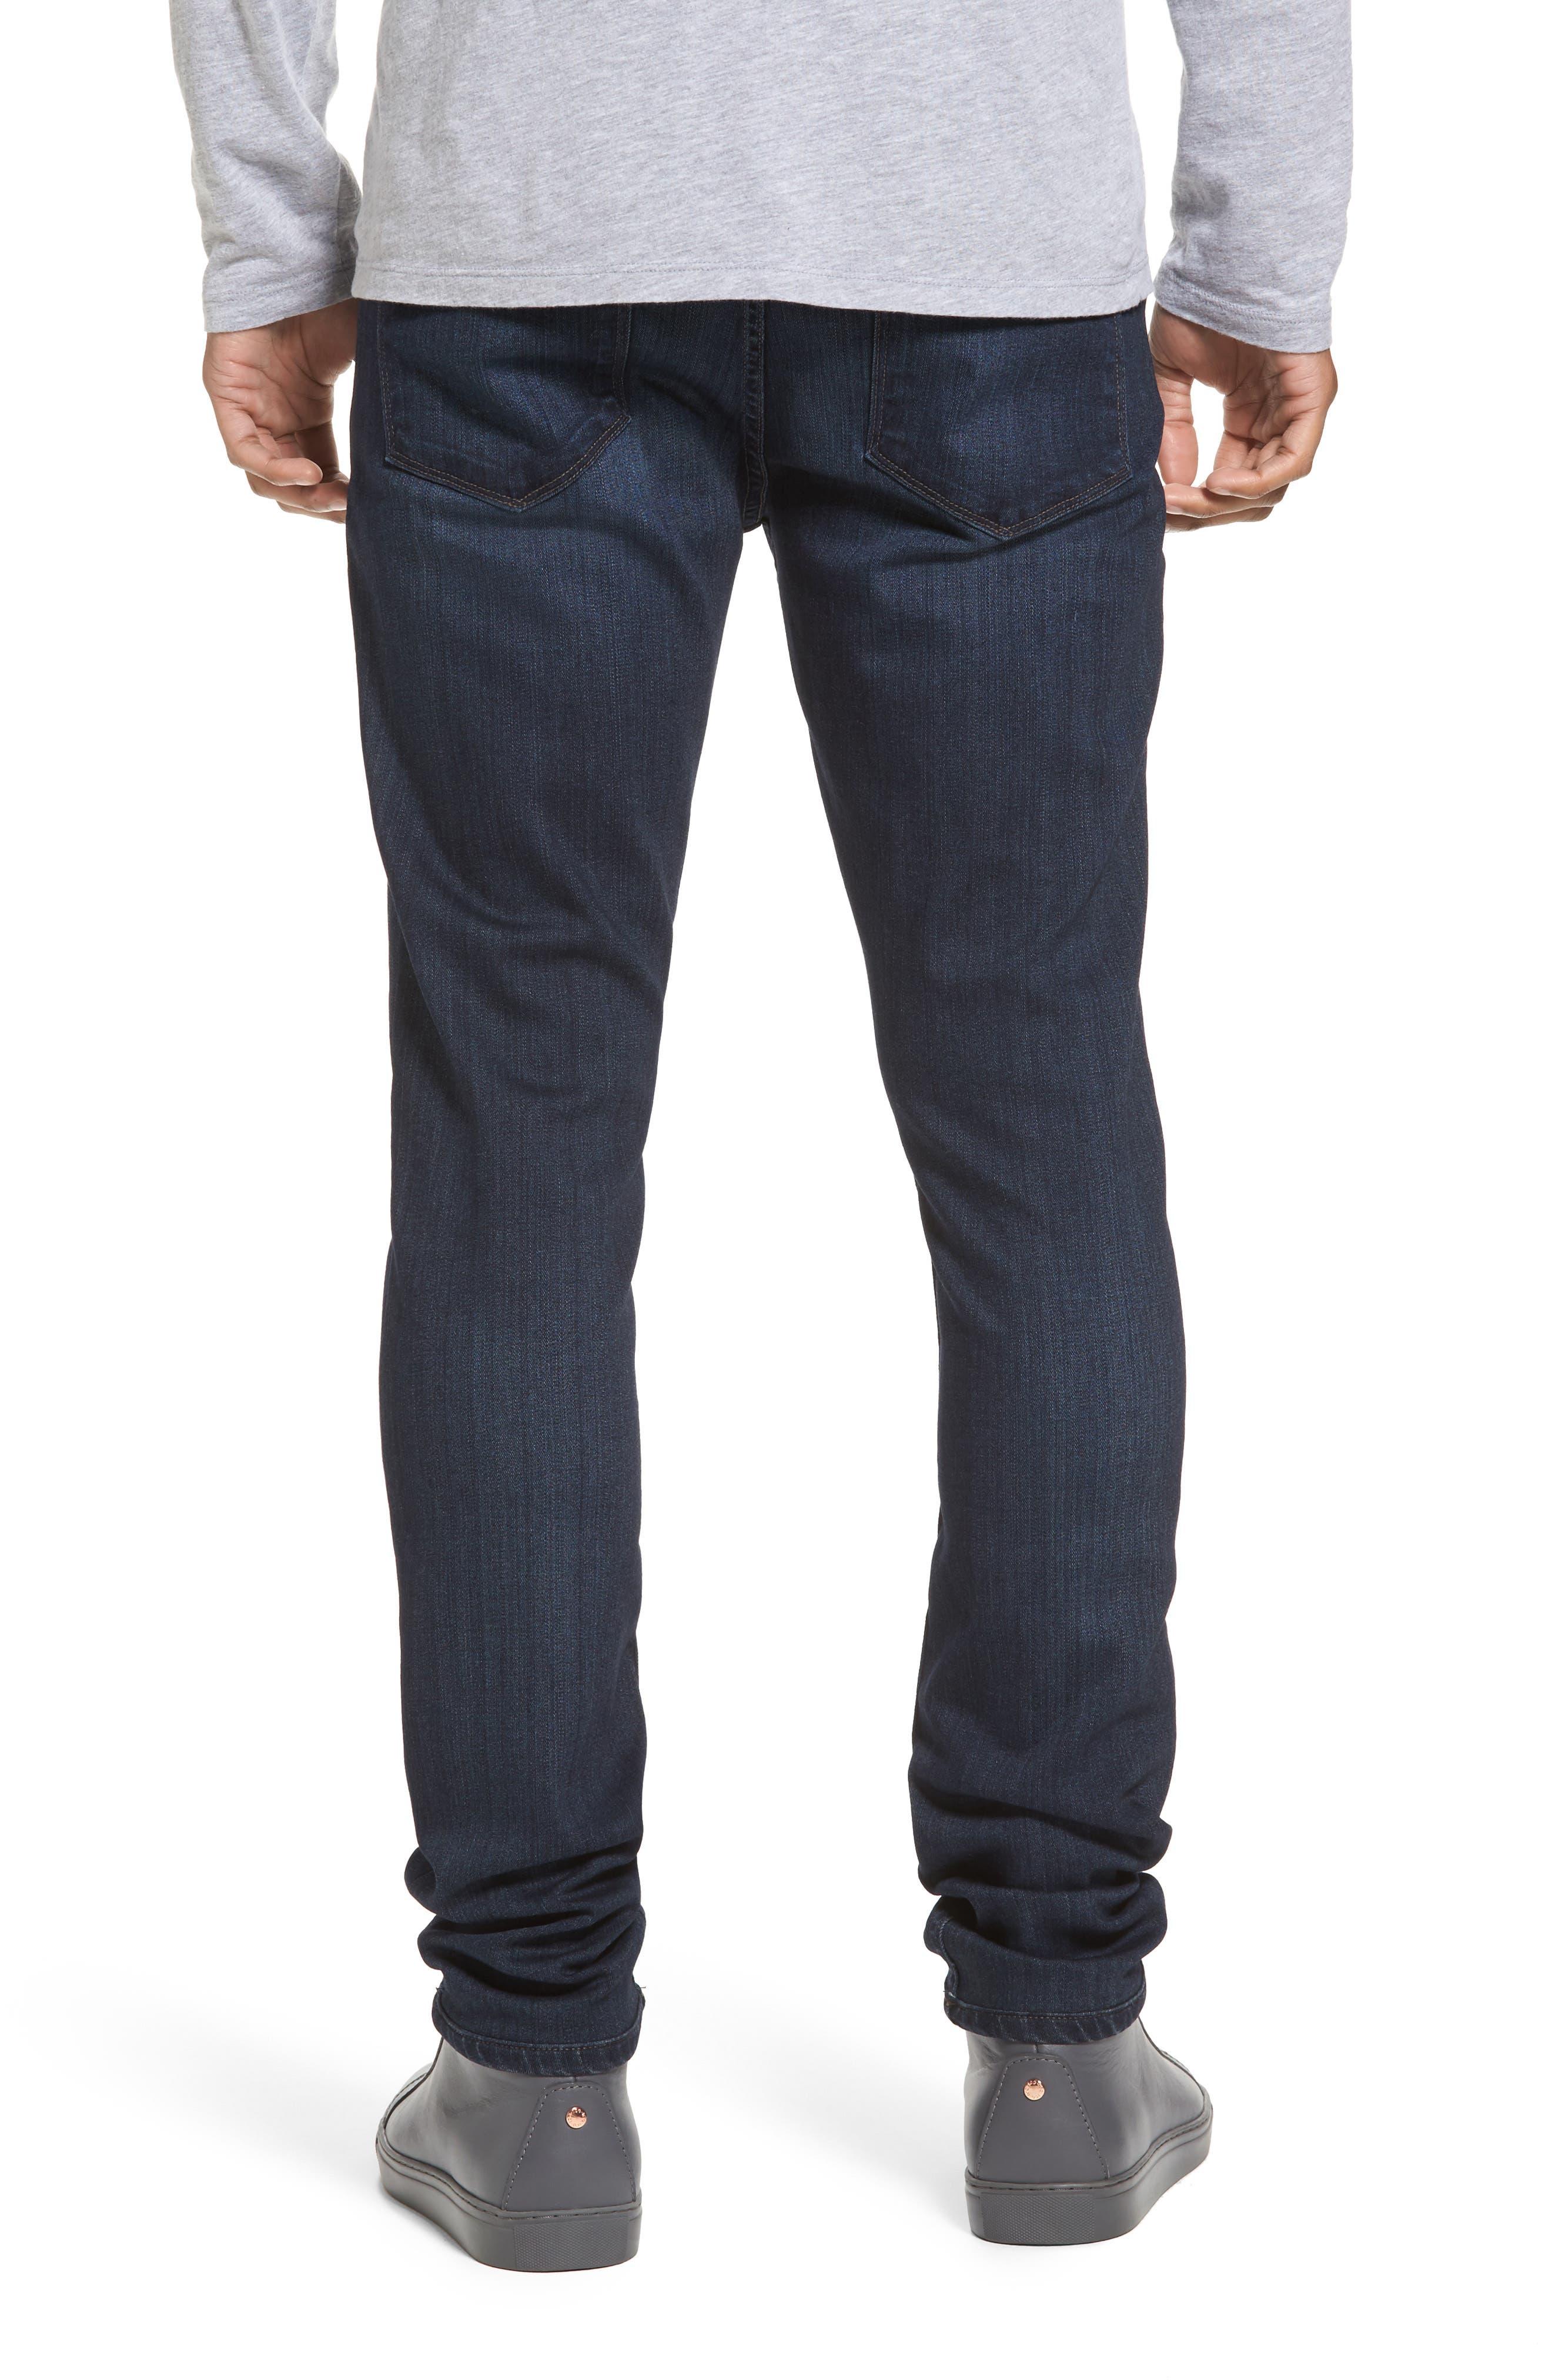 Transcend - Croft Skinny Fit Jeans,                             Alternate thumbnail 2, color,                             Barron